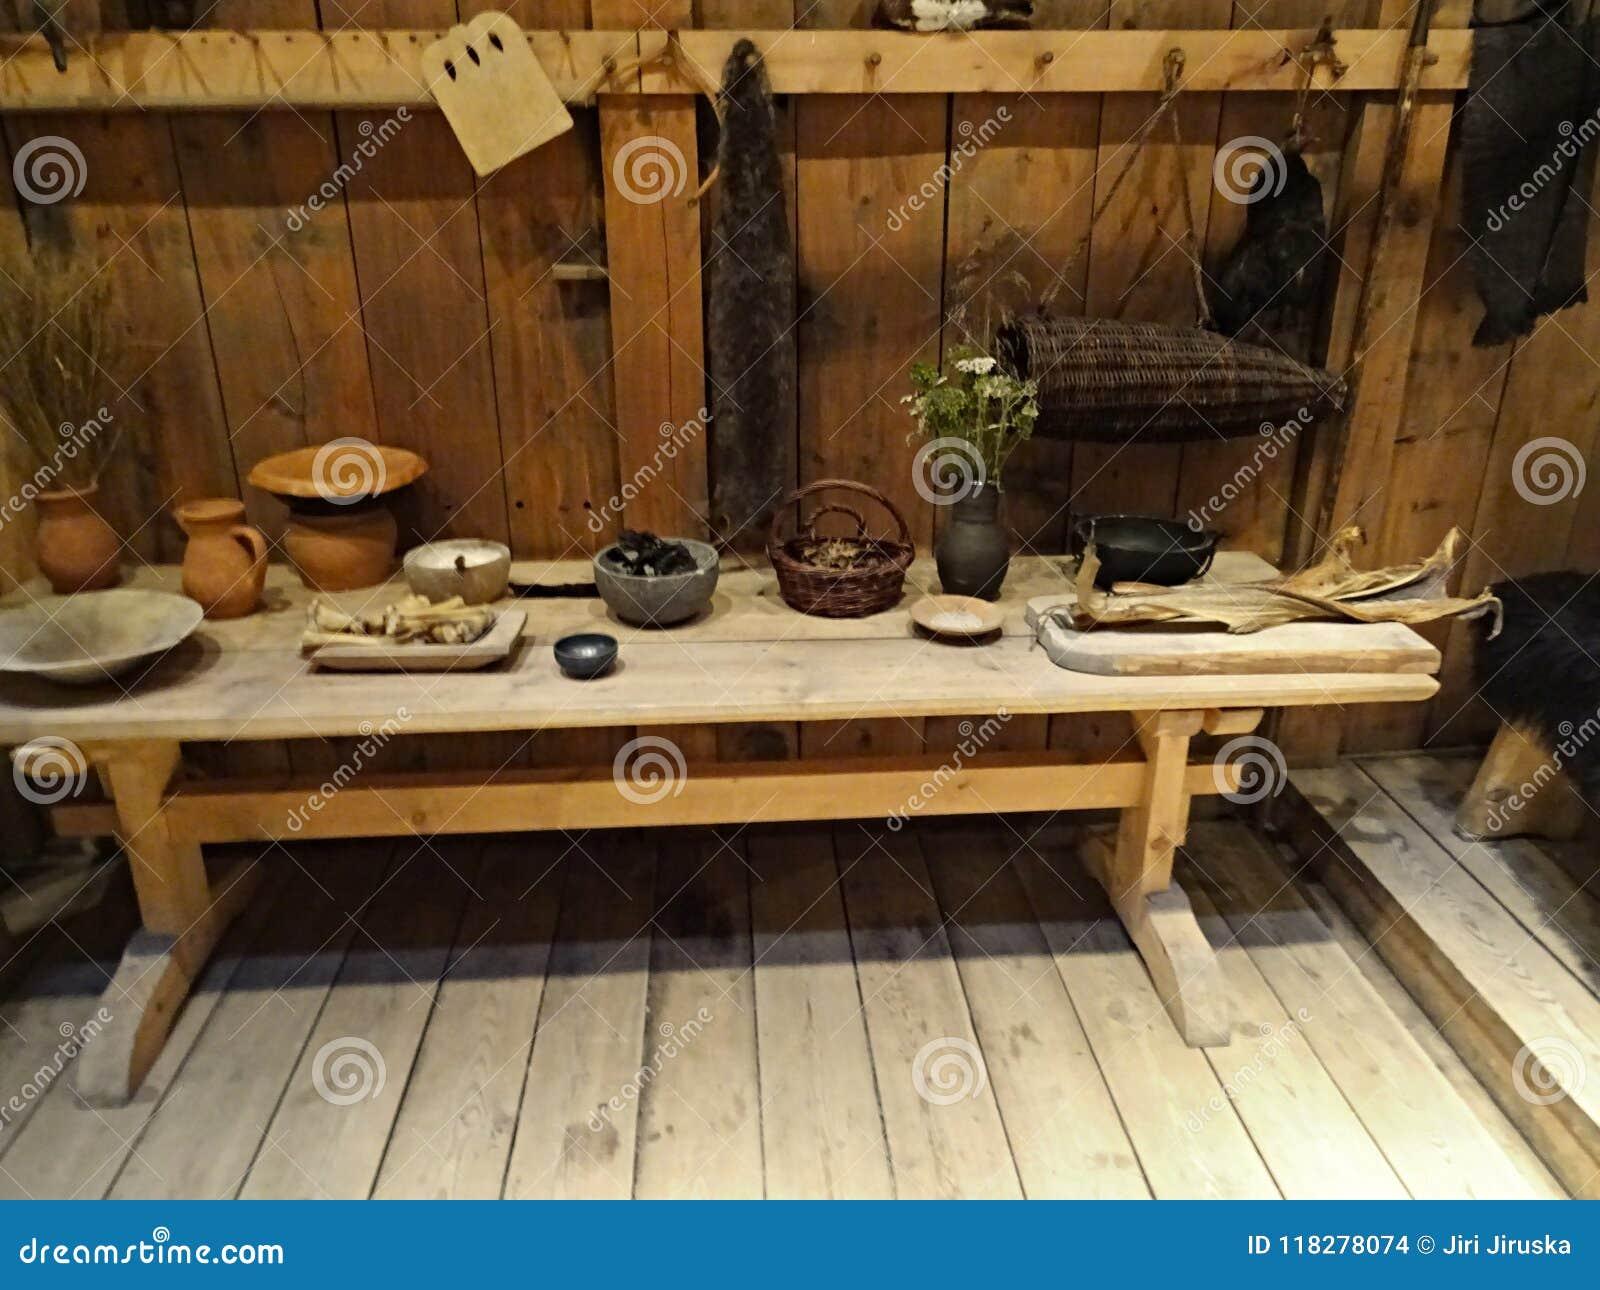 75 Viking Kitchen Photos Free Royalty Free Stock Photos From Dreamstime